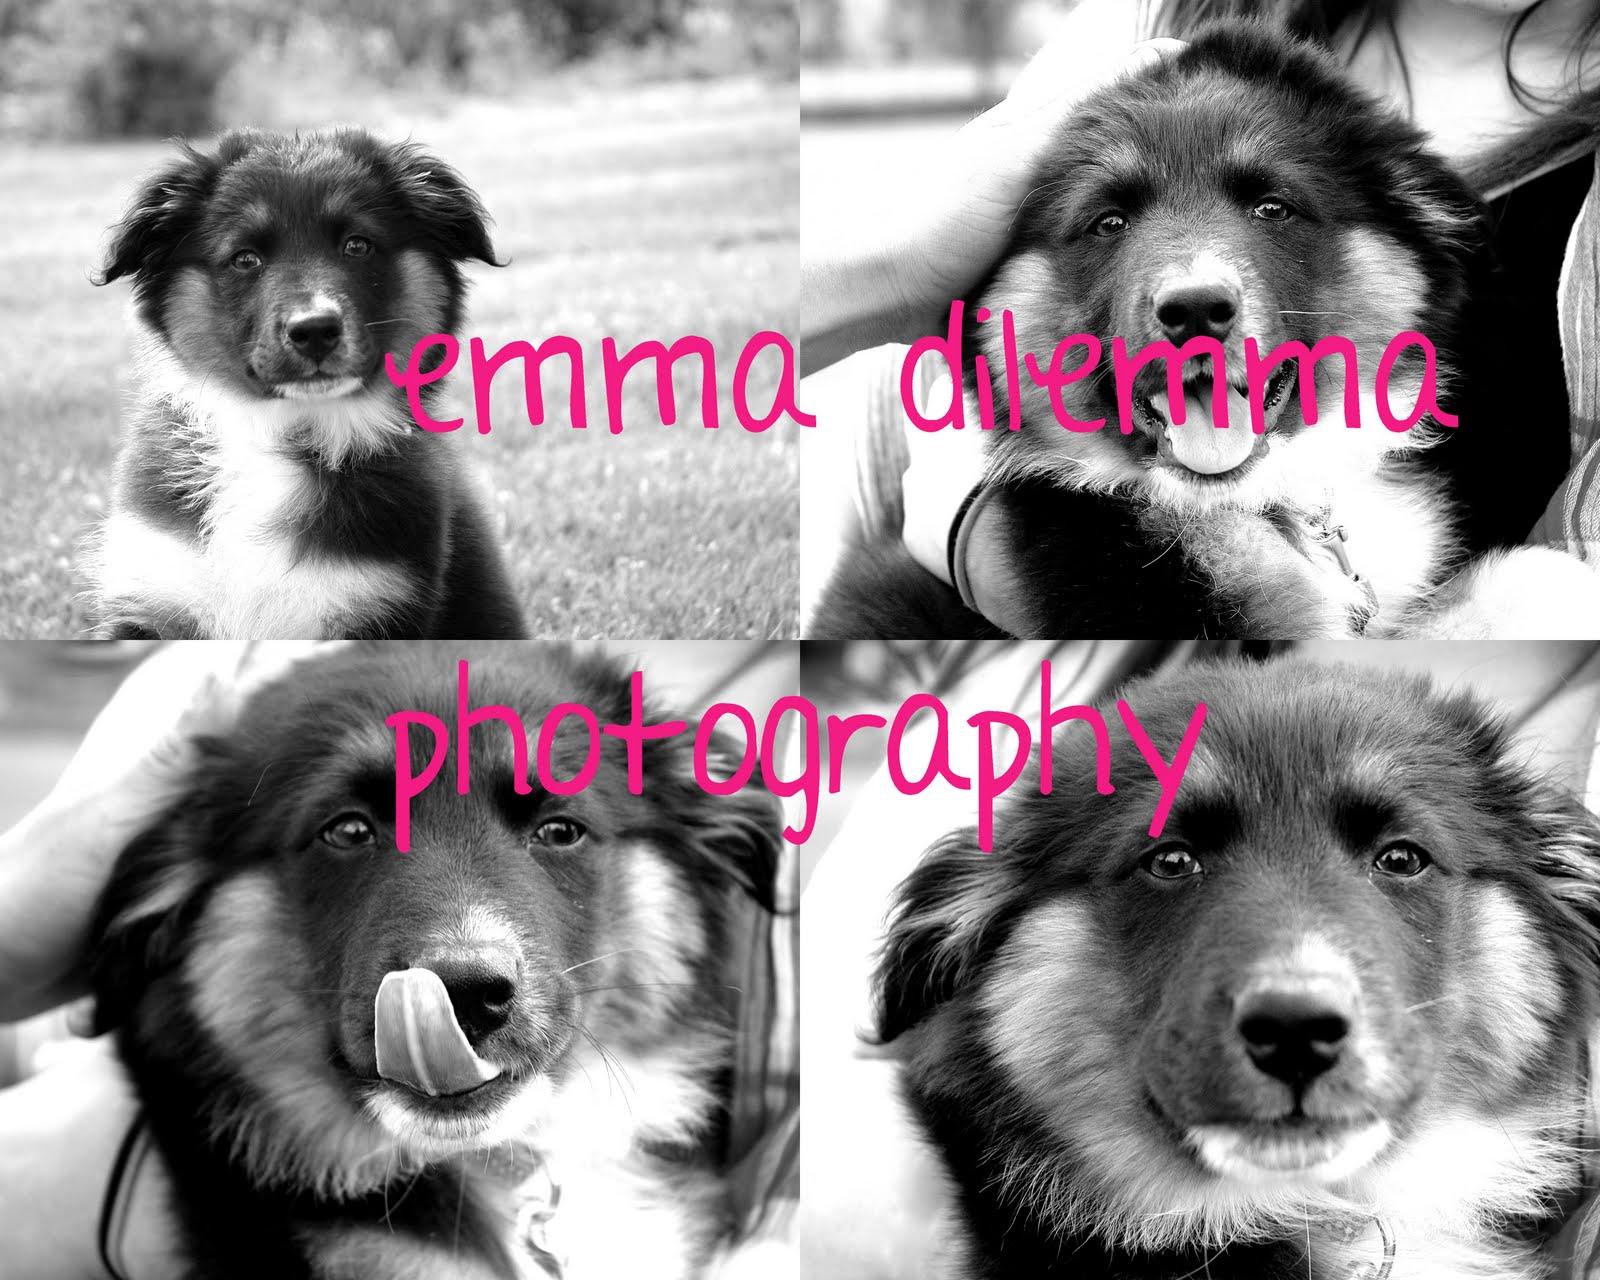 emma dilemma photography